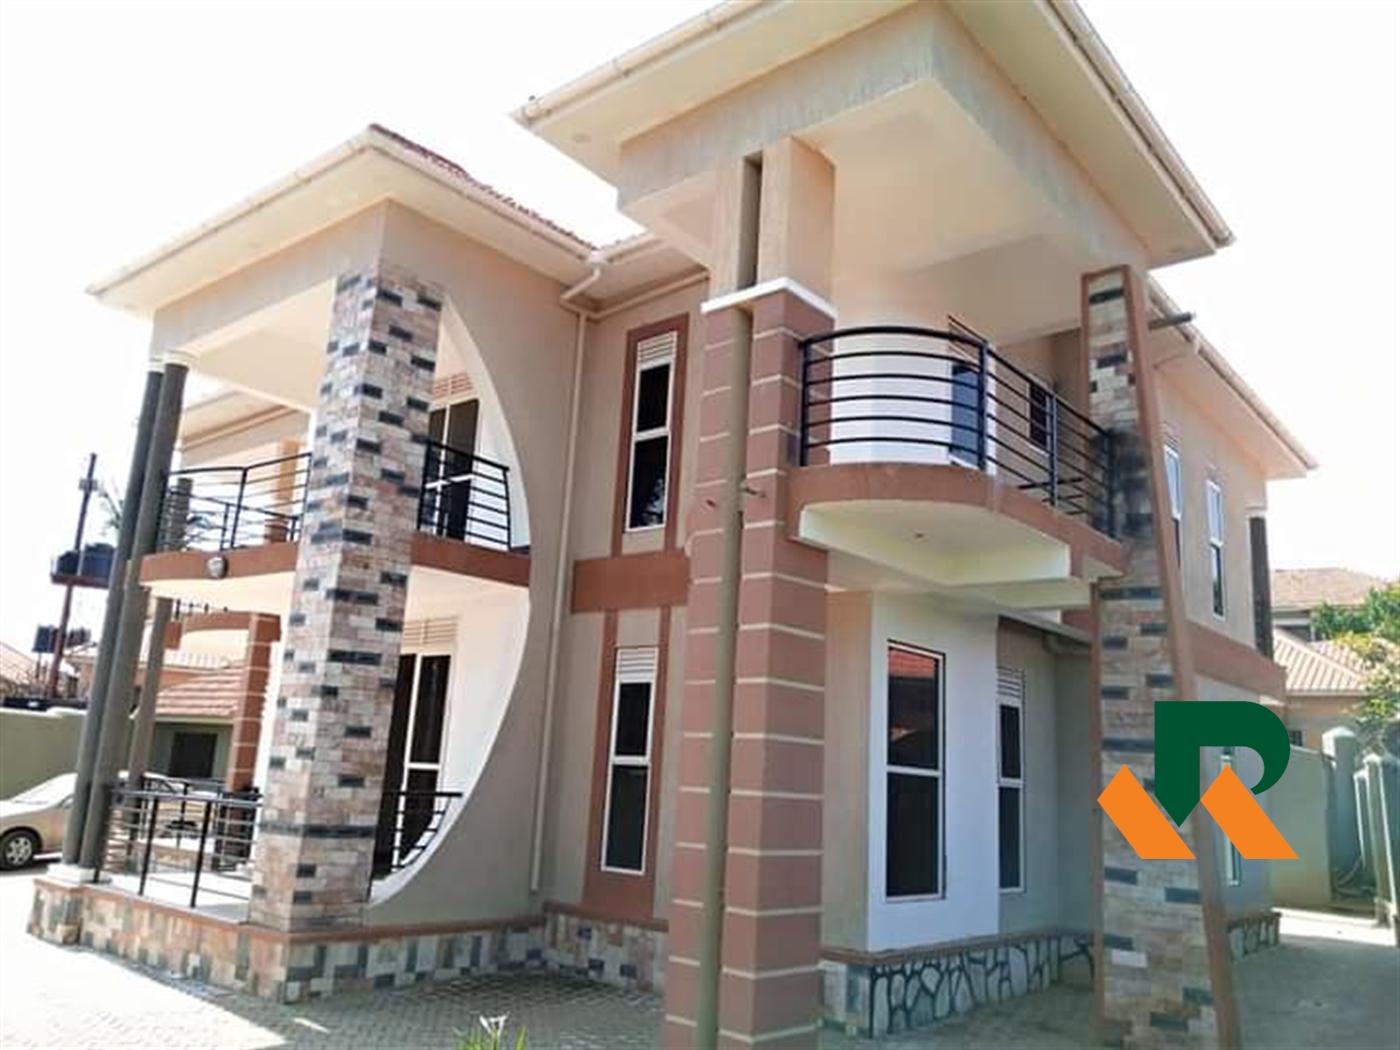 Storyed house for rent in Najjera Wakiso